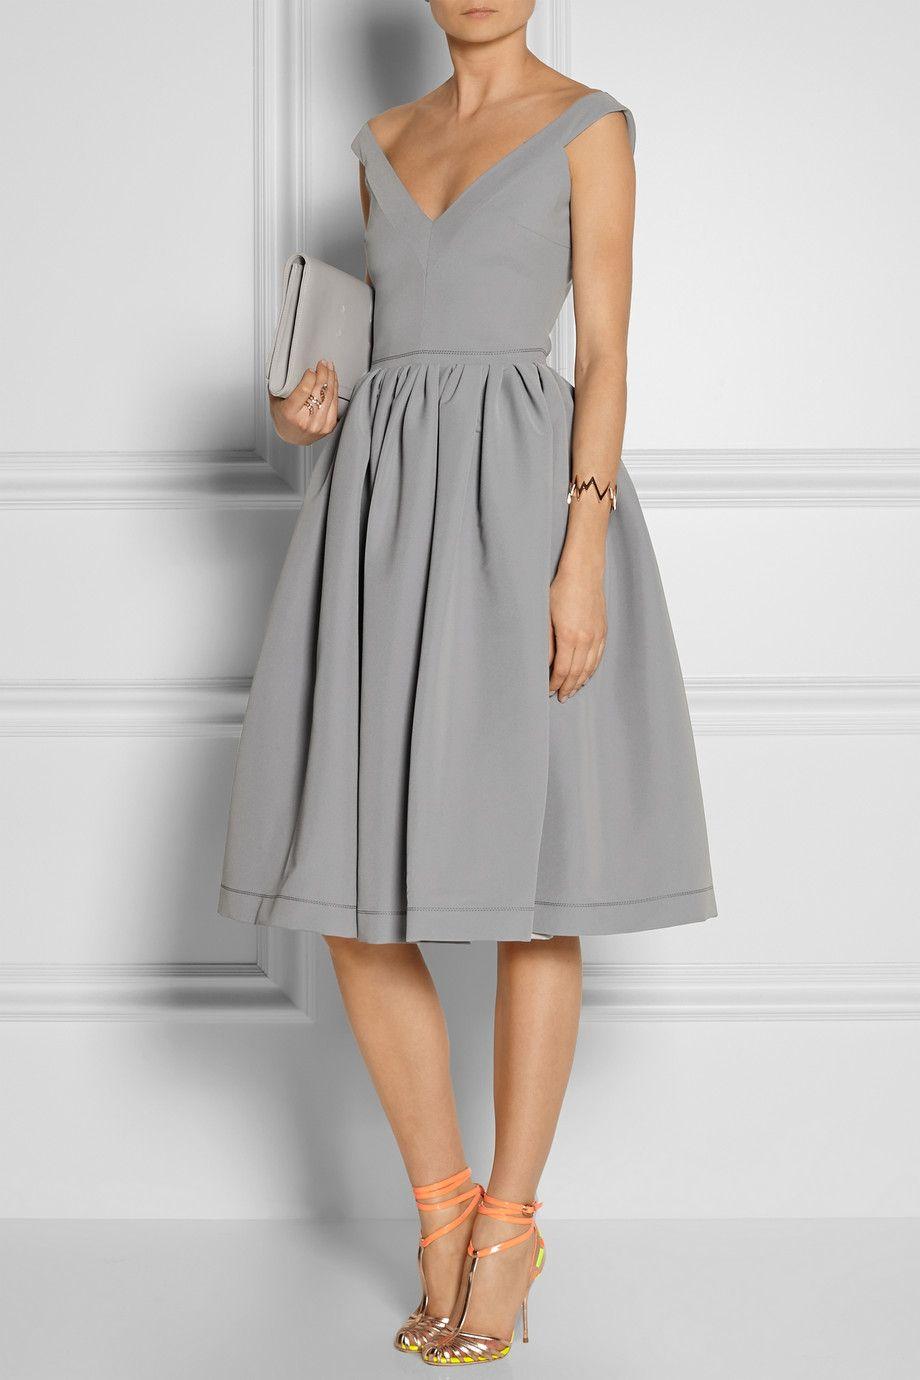 Preen By Thornton Bregazzi Flo Satin Crepe Dress In Dove Gray